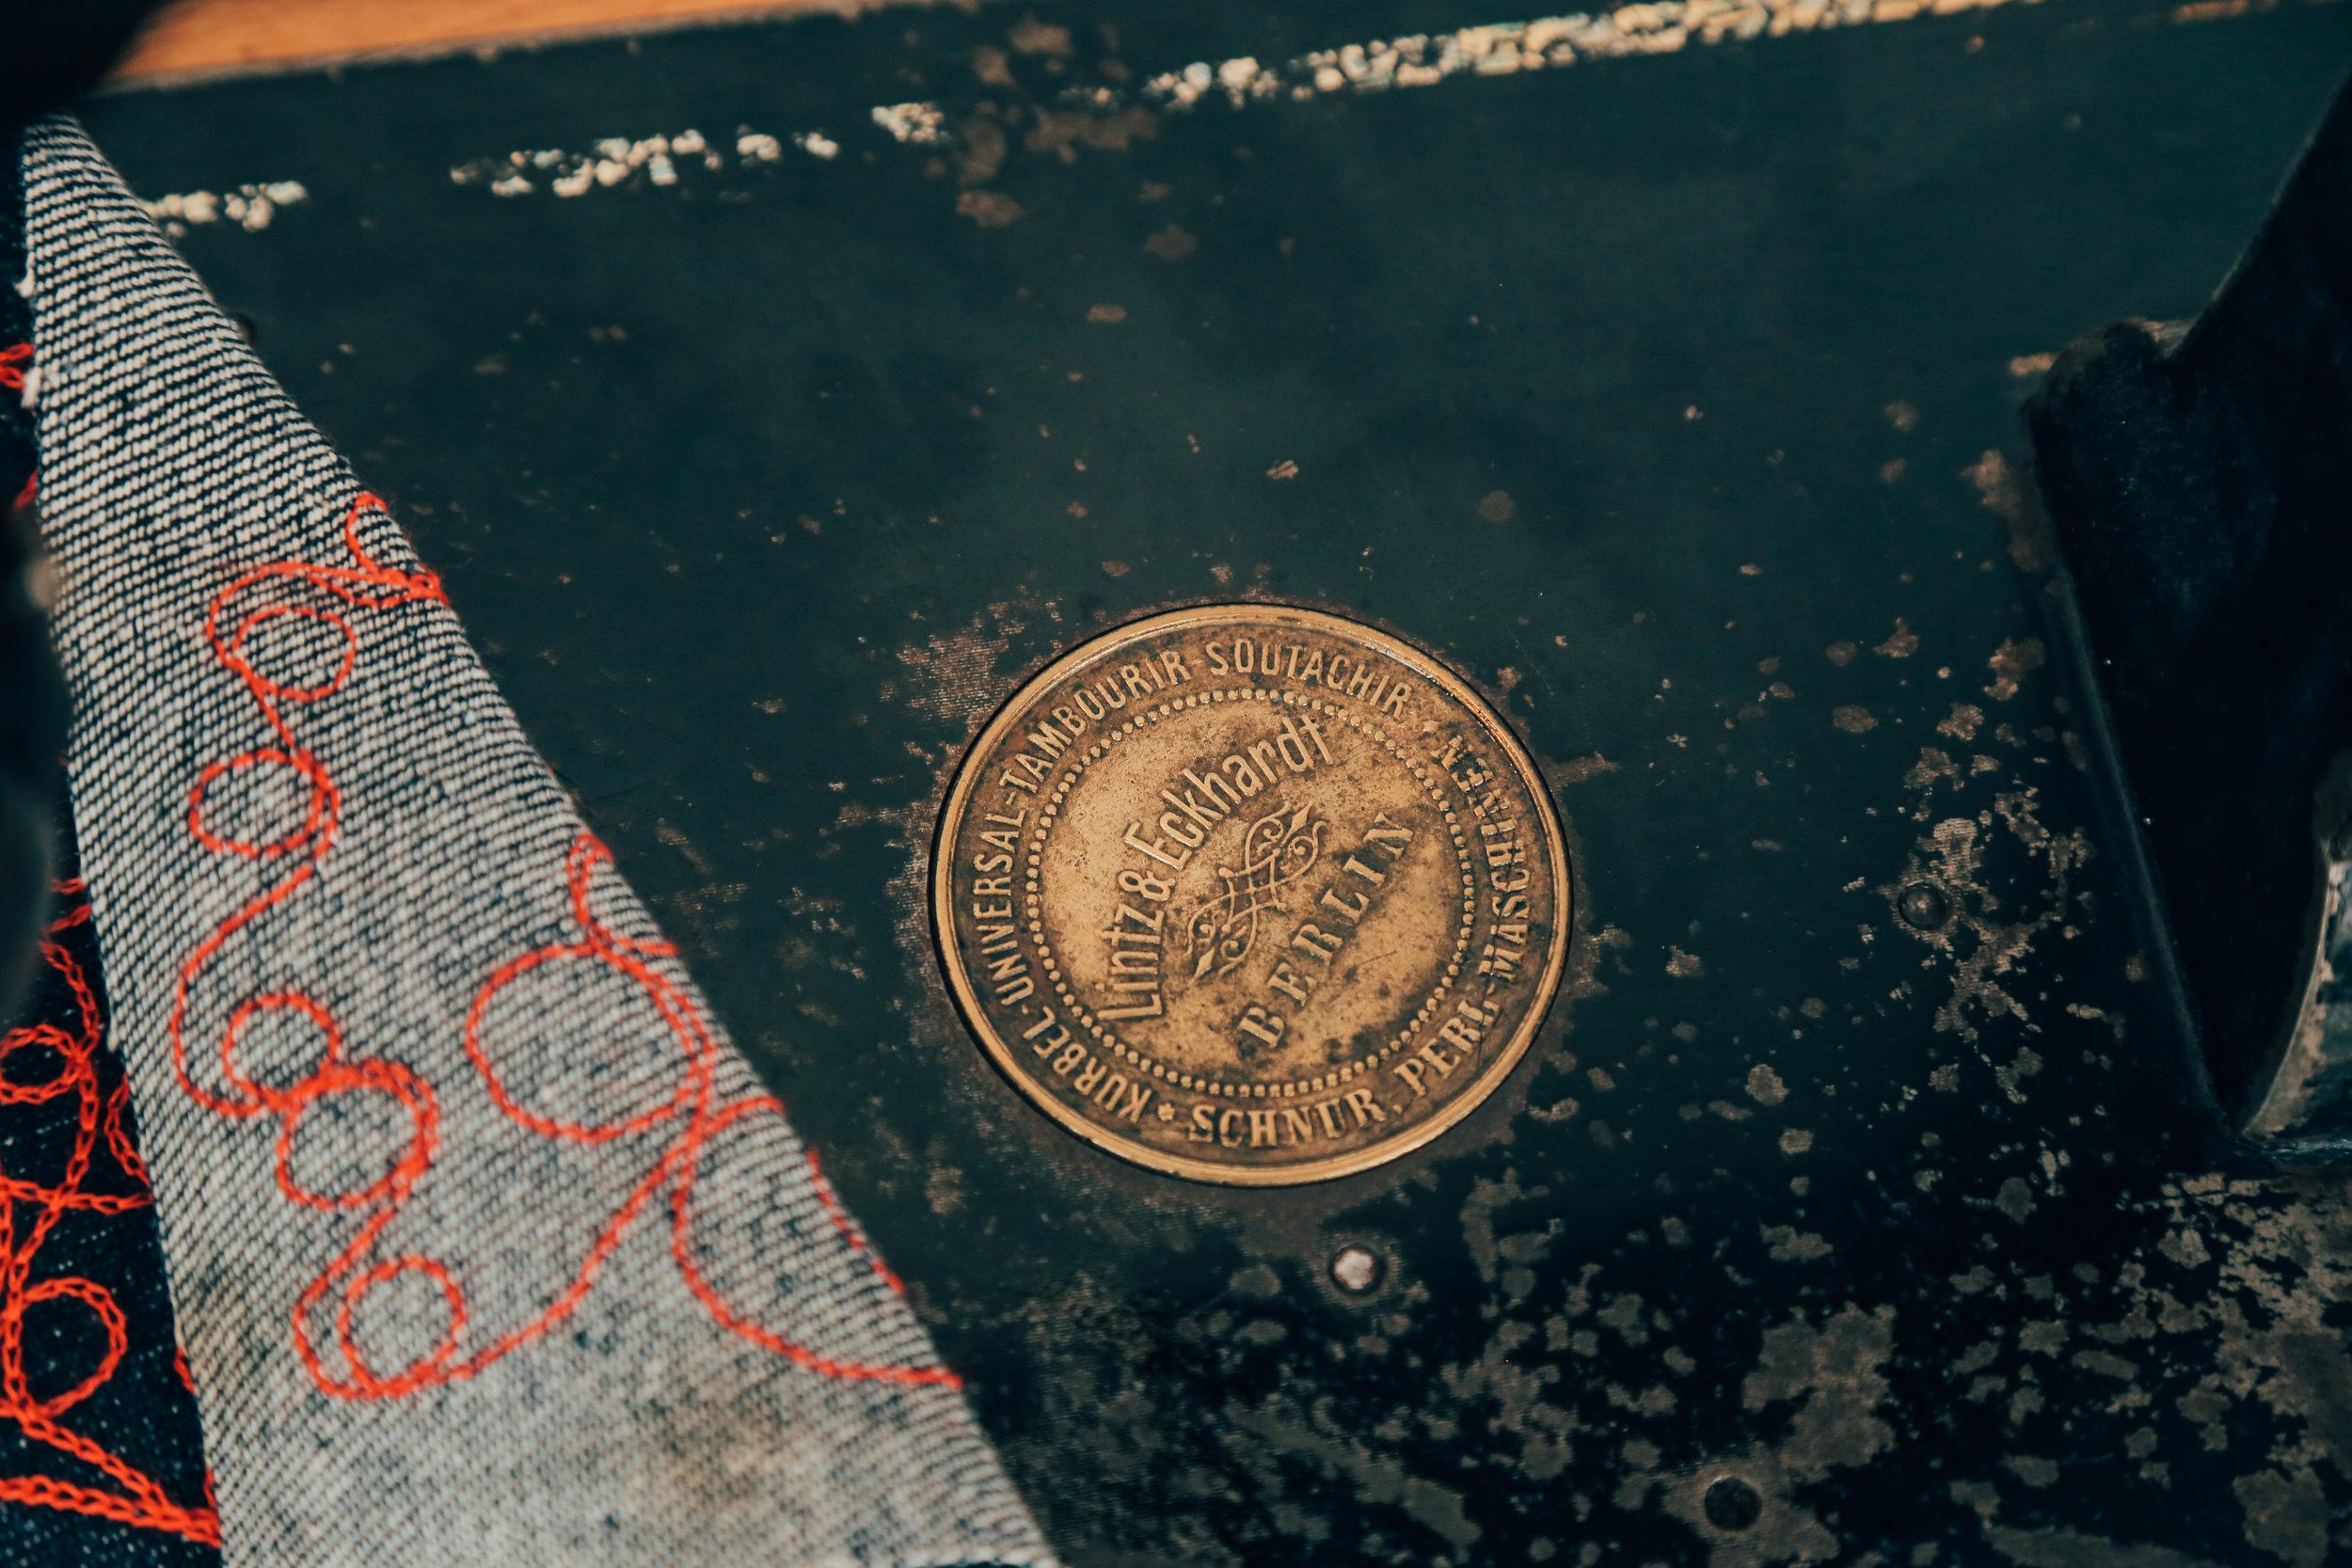 Lintz & Eckhardt 11 Cornely K vintage chainstitch embroidery machine 3